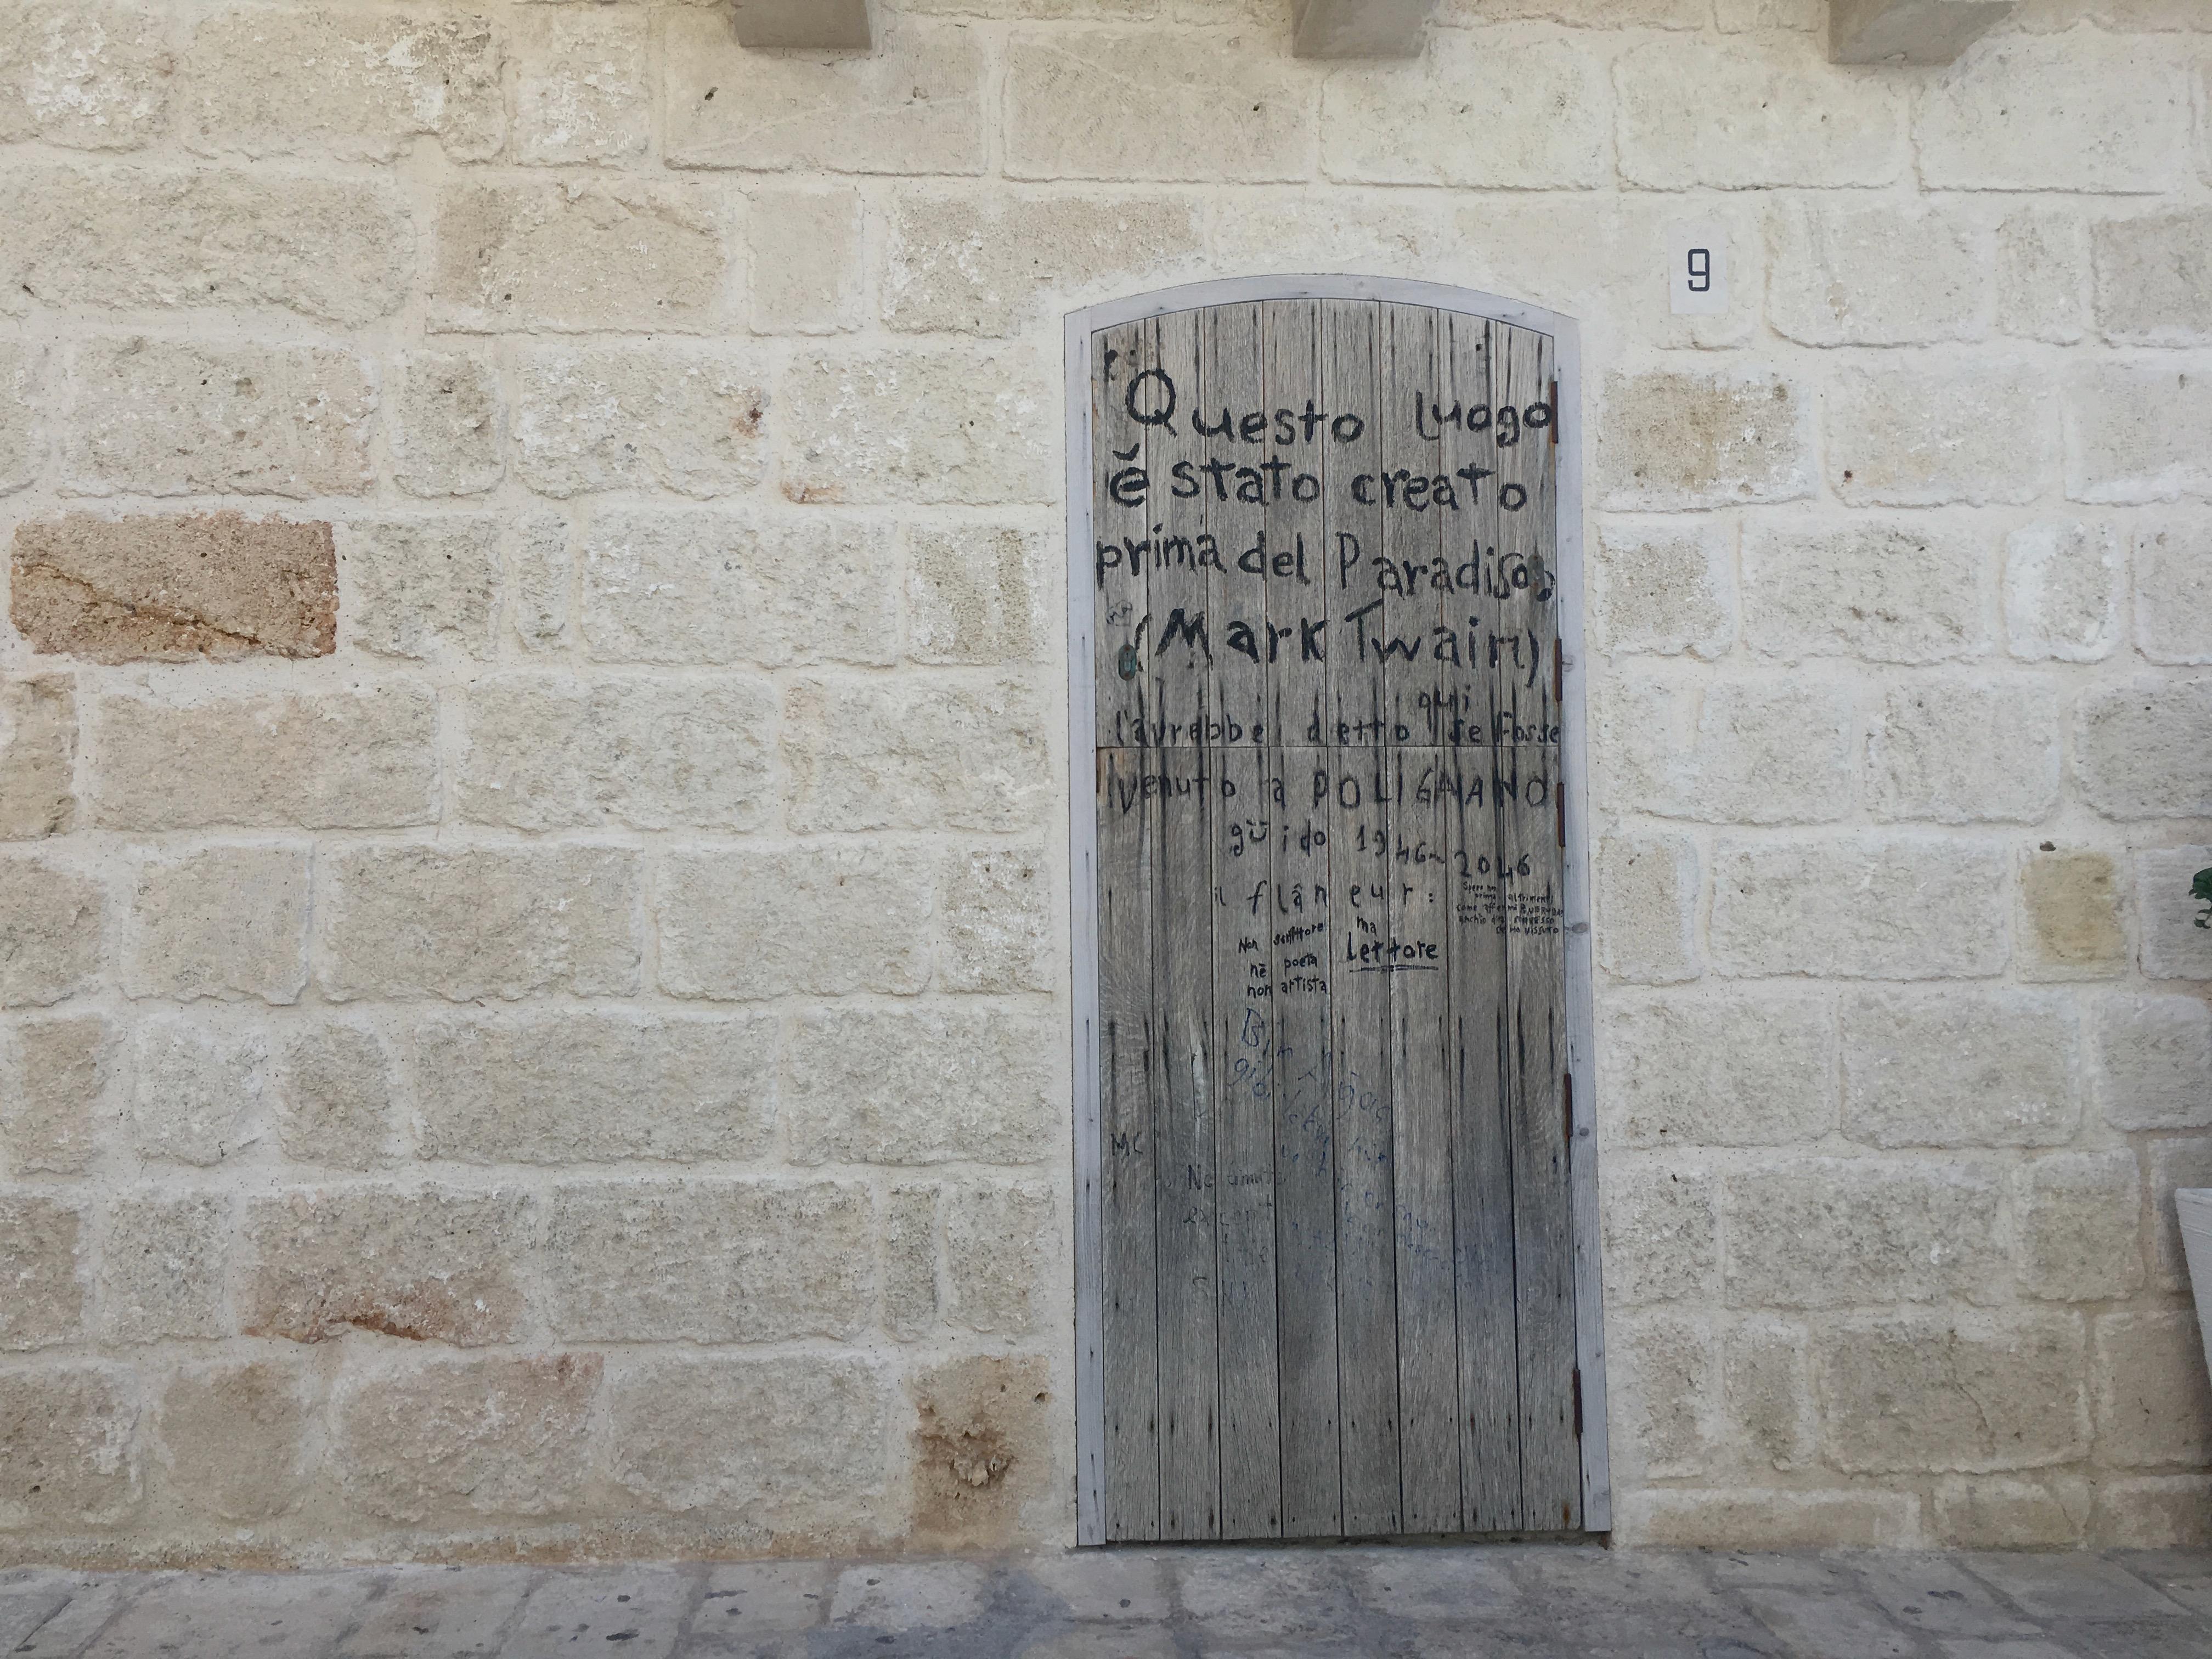 Cytaty powstałe na murach w Polignano a Mare